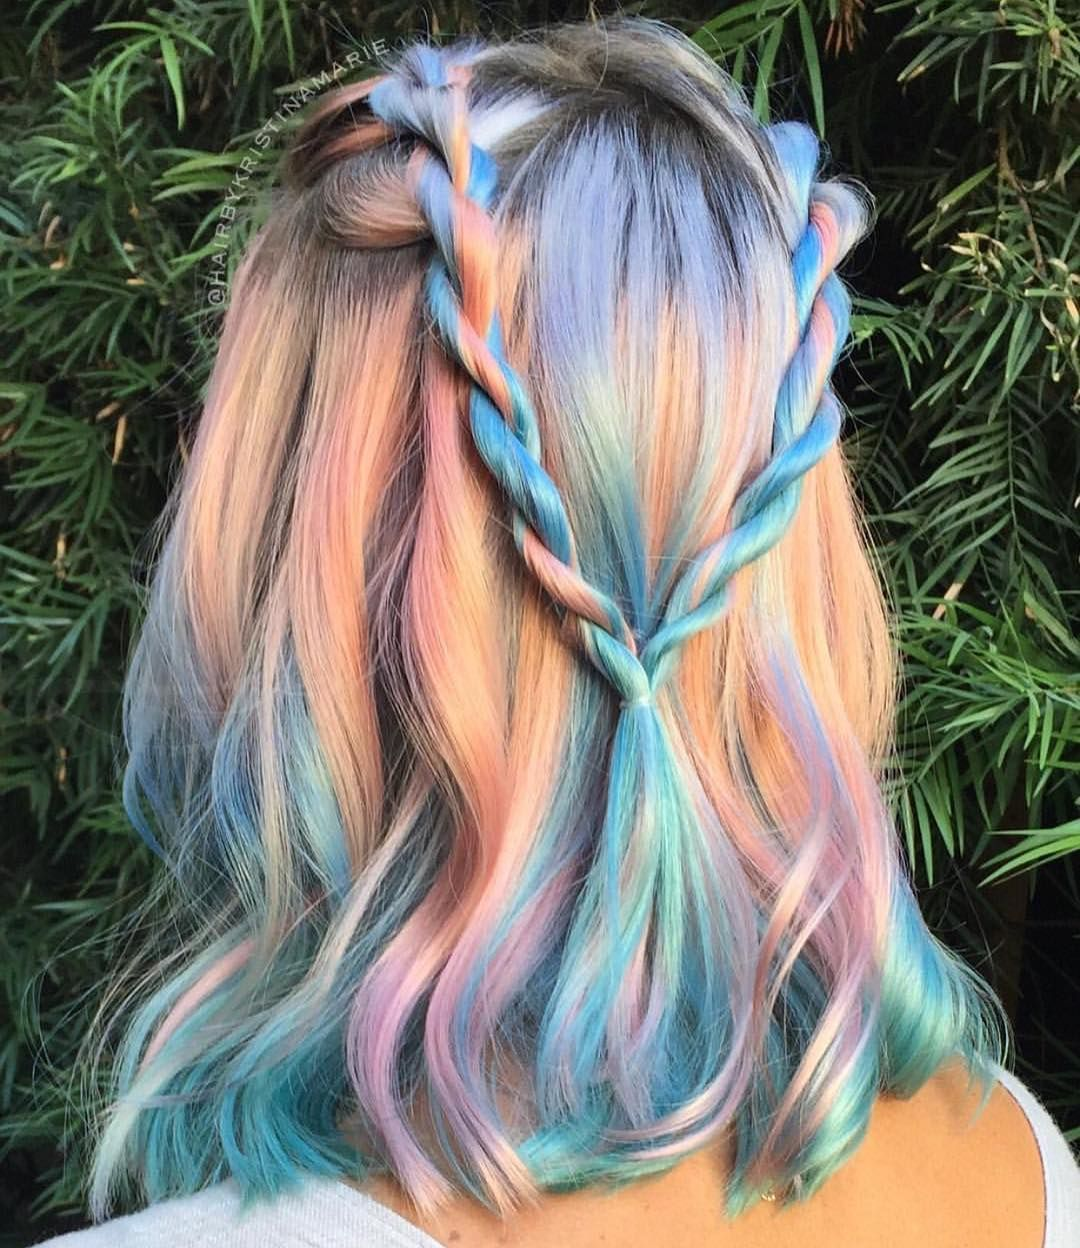 Pin by mari vosse on hair pinterest coachella san diego and mermaid